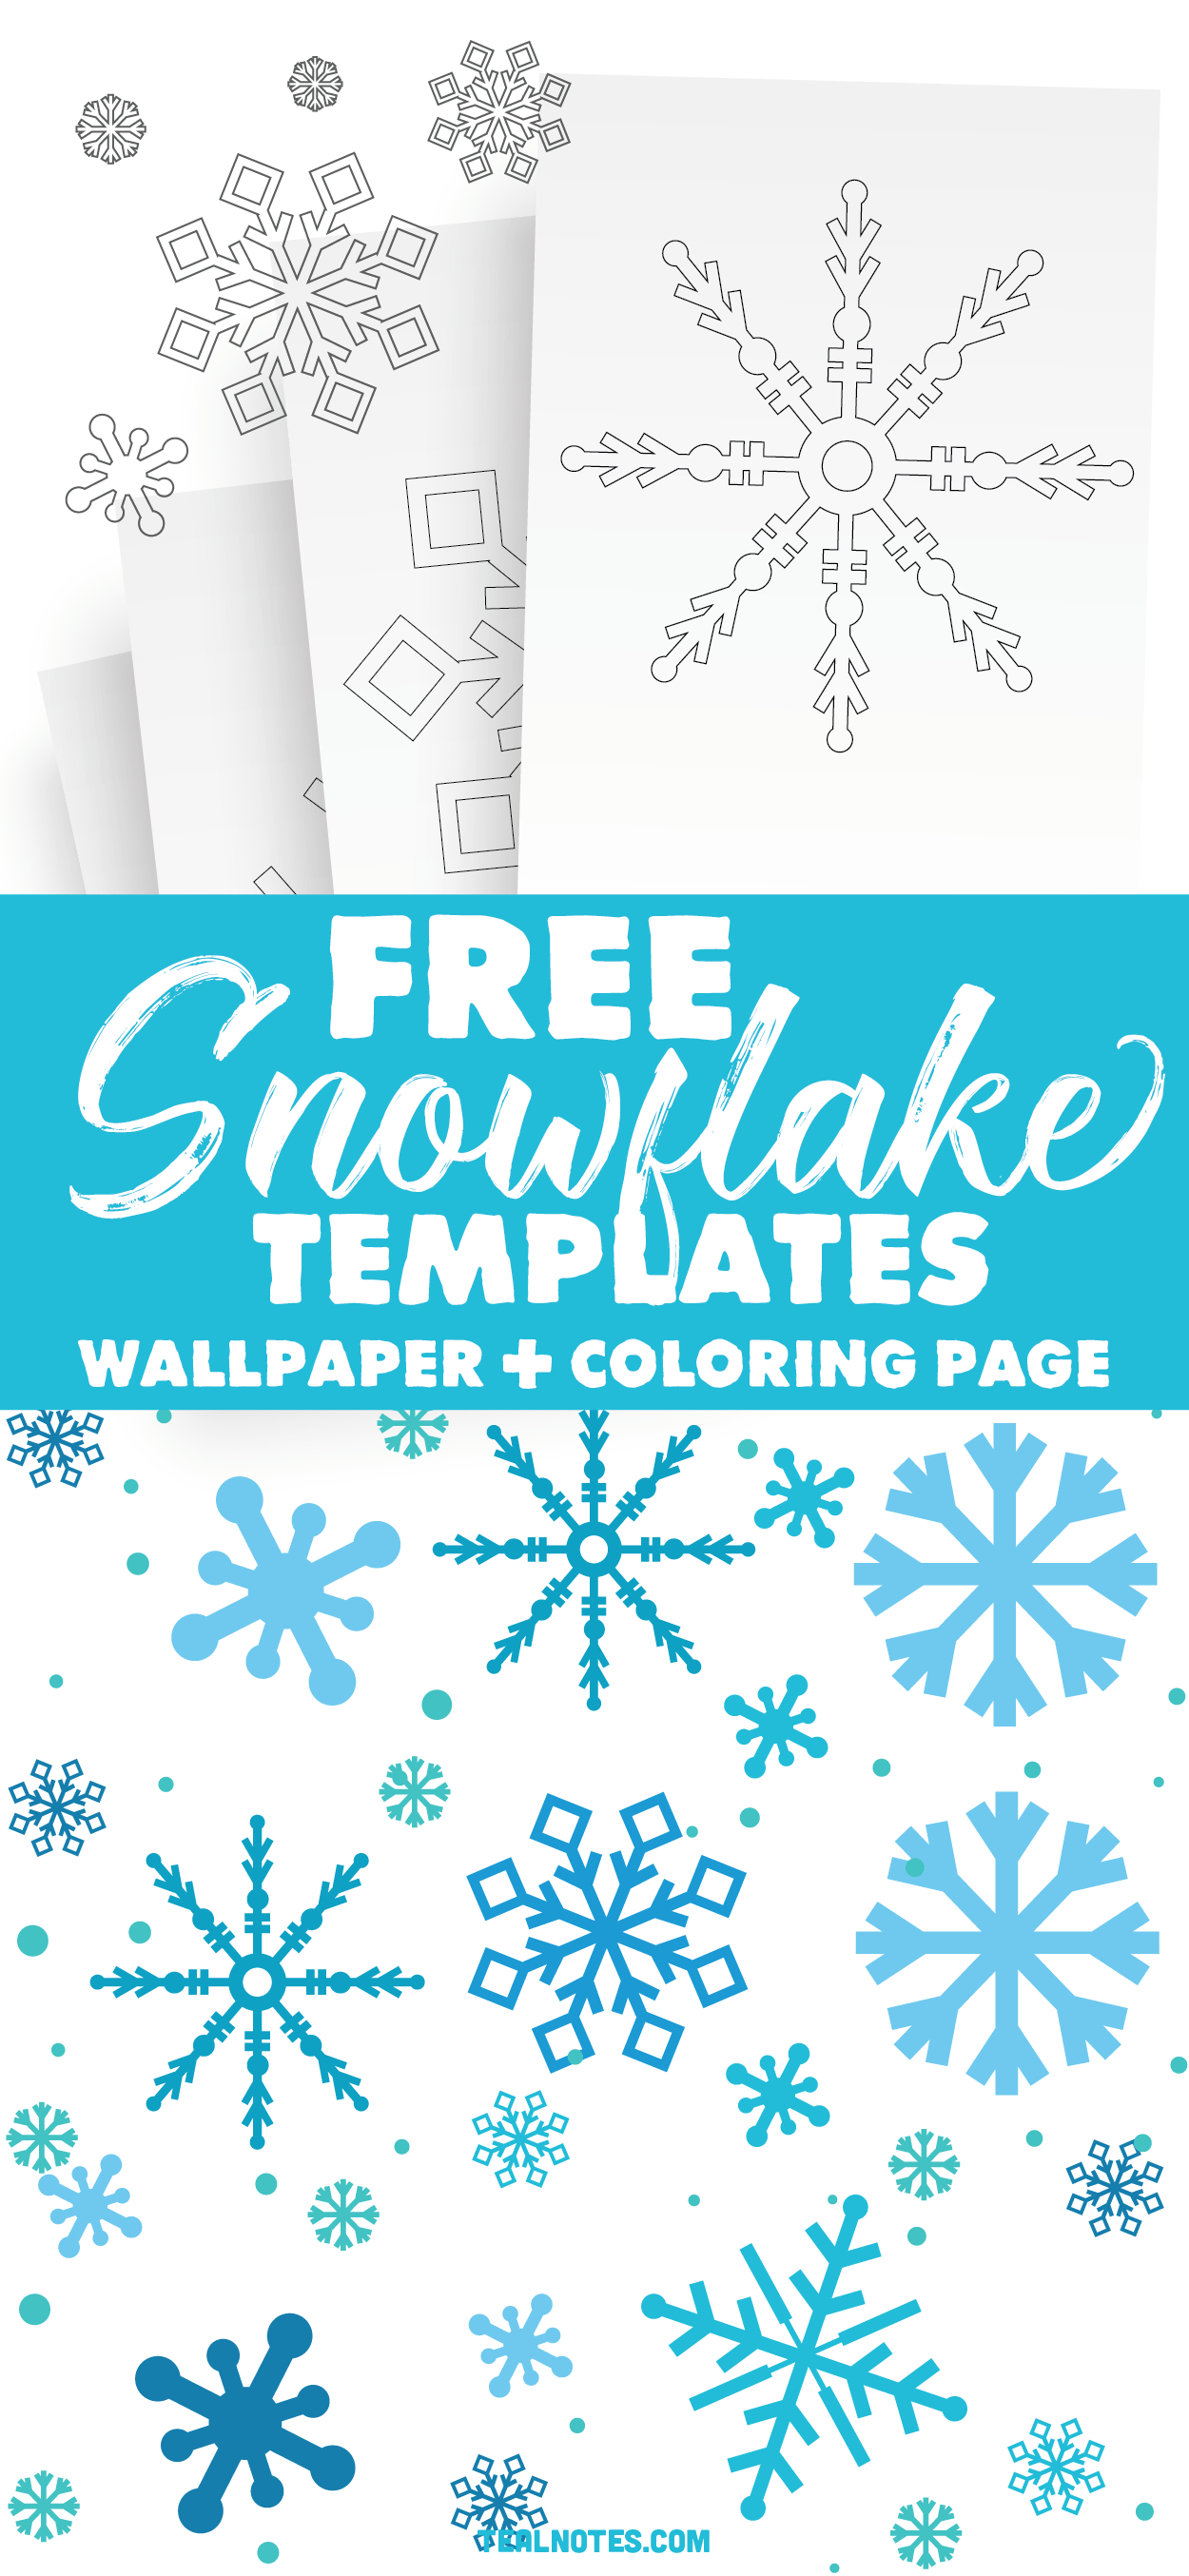 Free Snowflake Template: Easy Paper Snowflakes To Cut And Color - Snowflake Template Free Printable